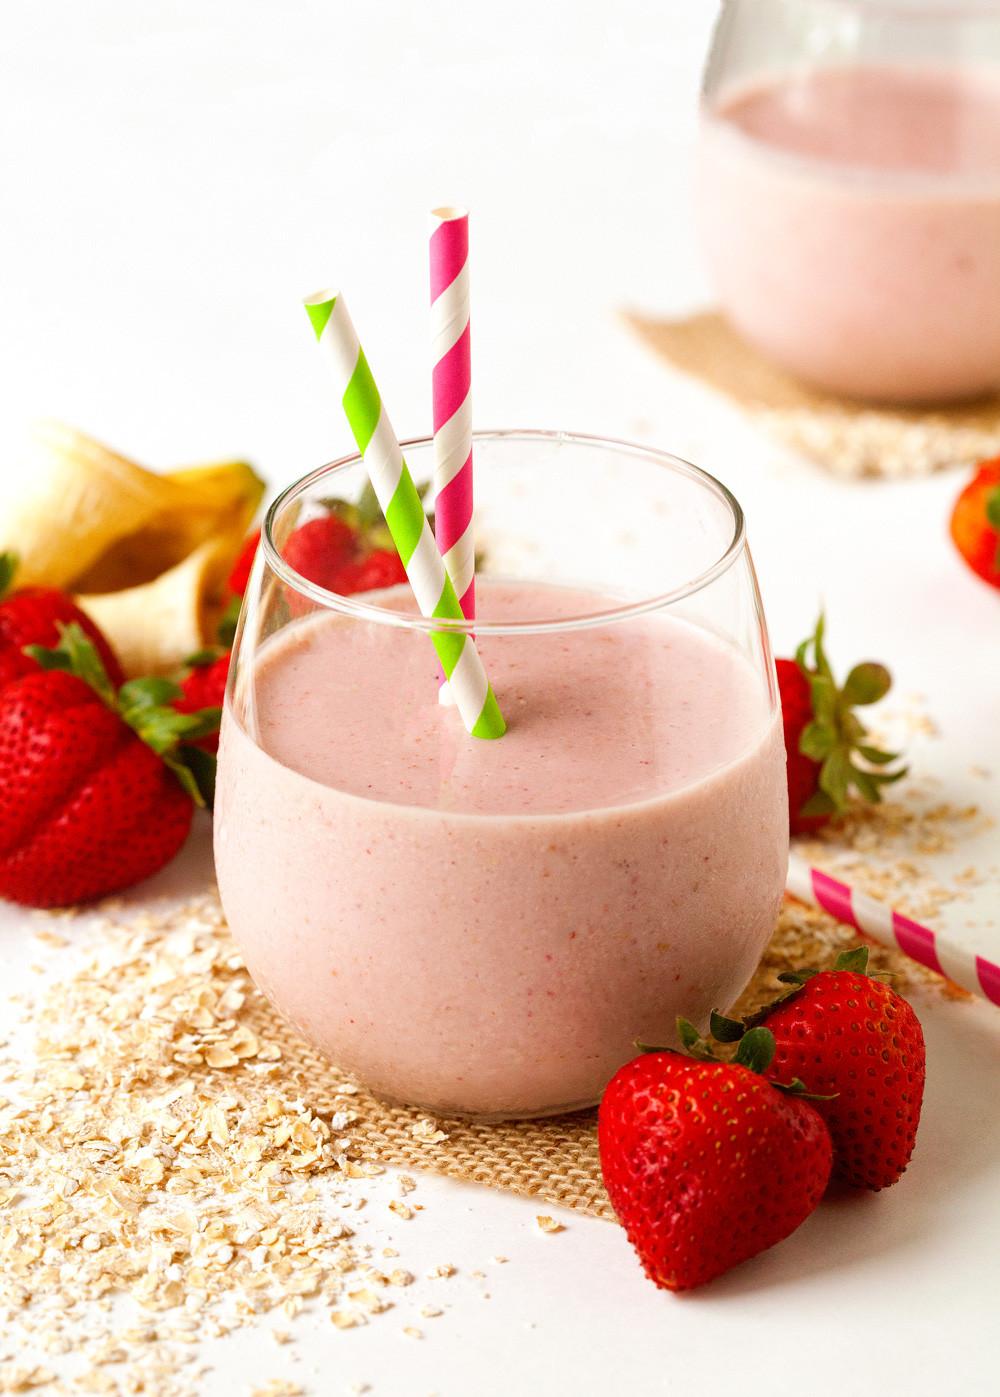 Best Healthy Breakfast Smoothies  The Very Best Breakfast Oatmeal Smoothie